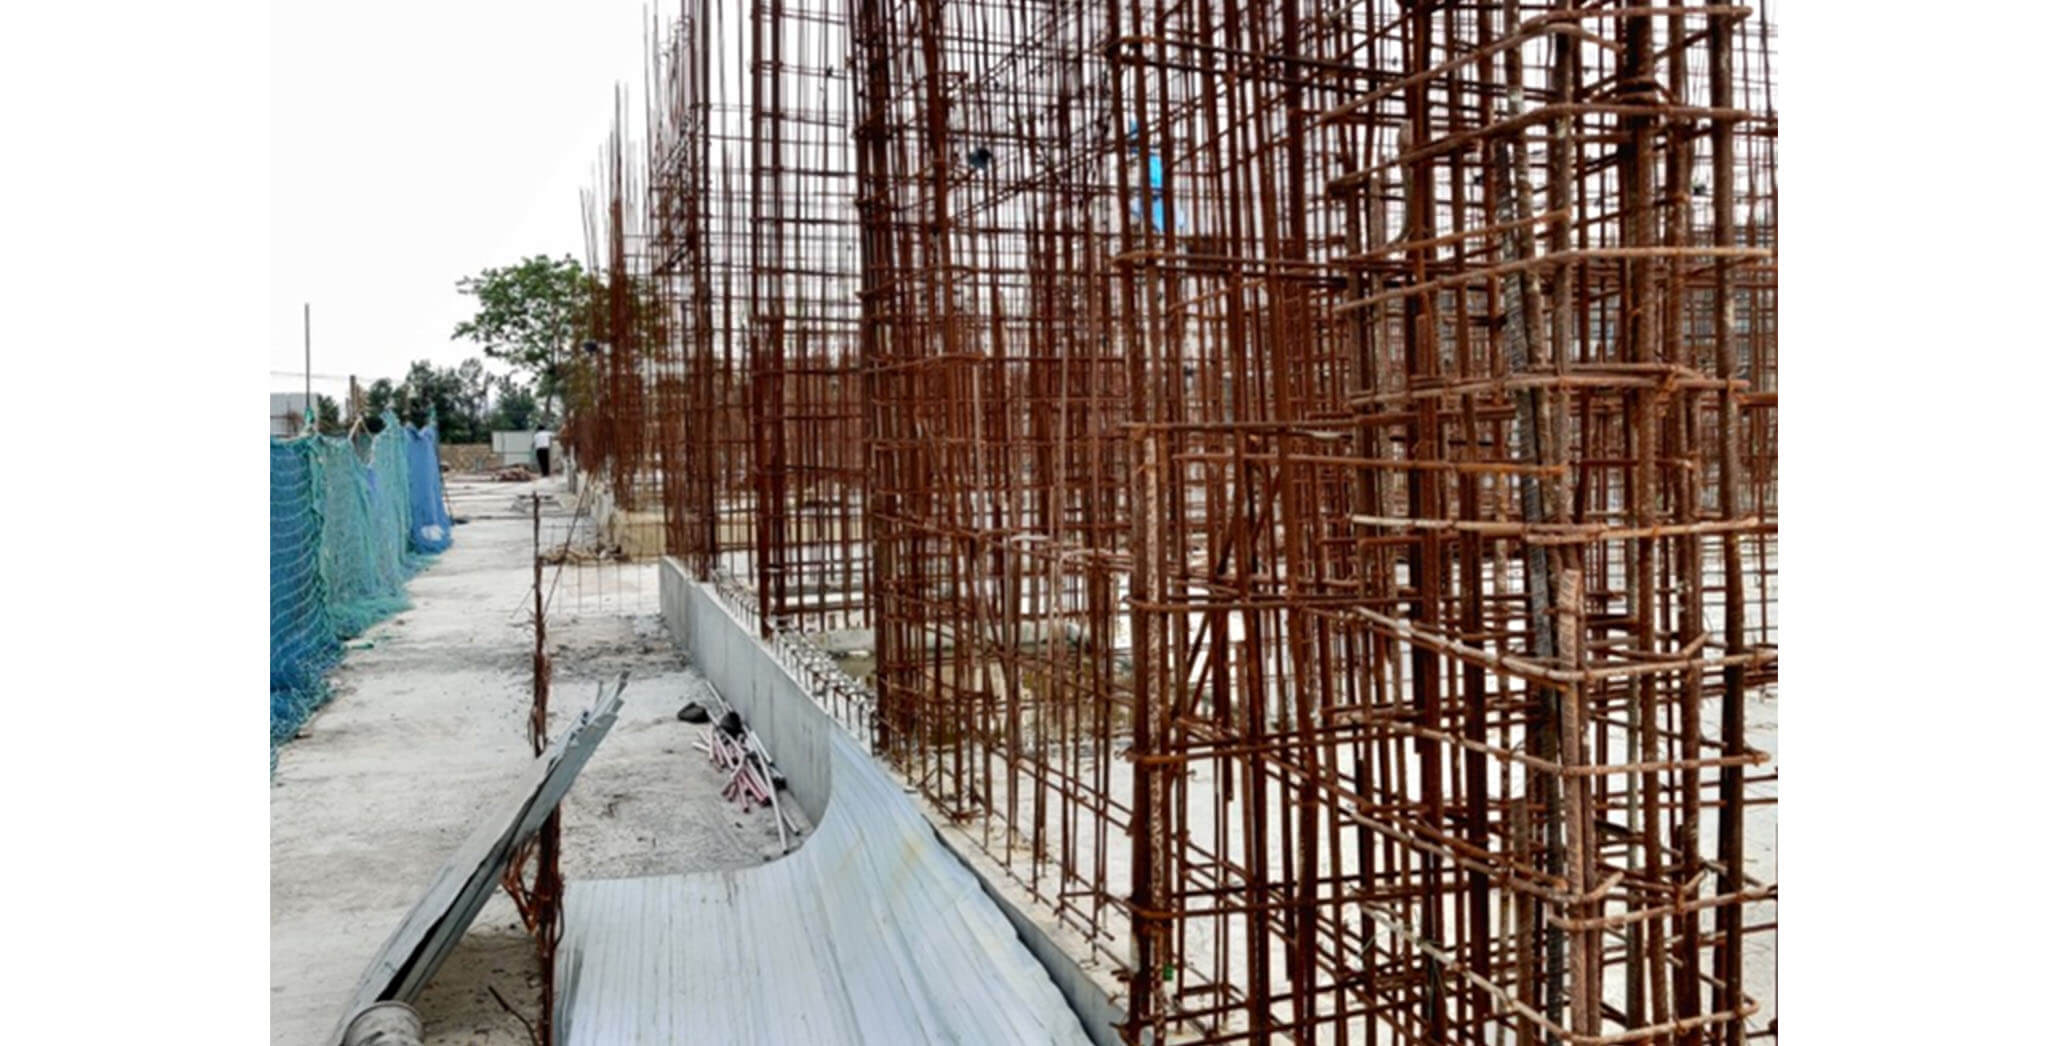 Jun 2020 - K Block: Ground floor slab completed